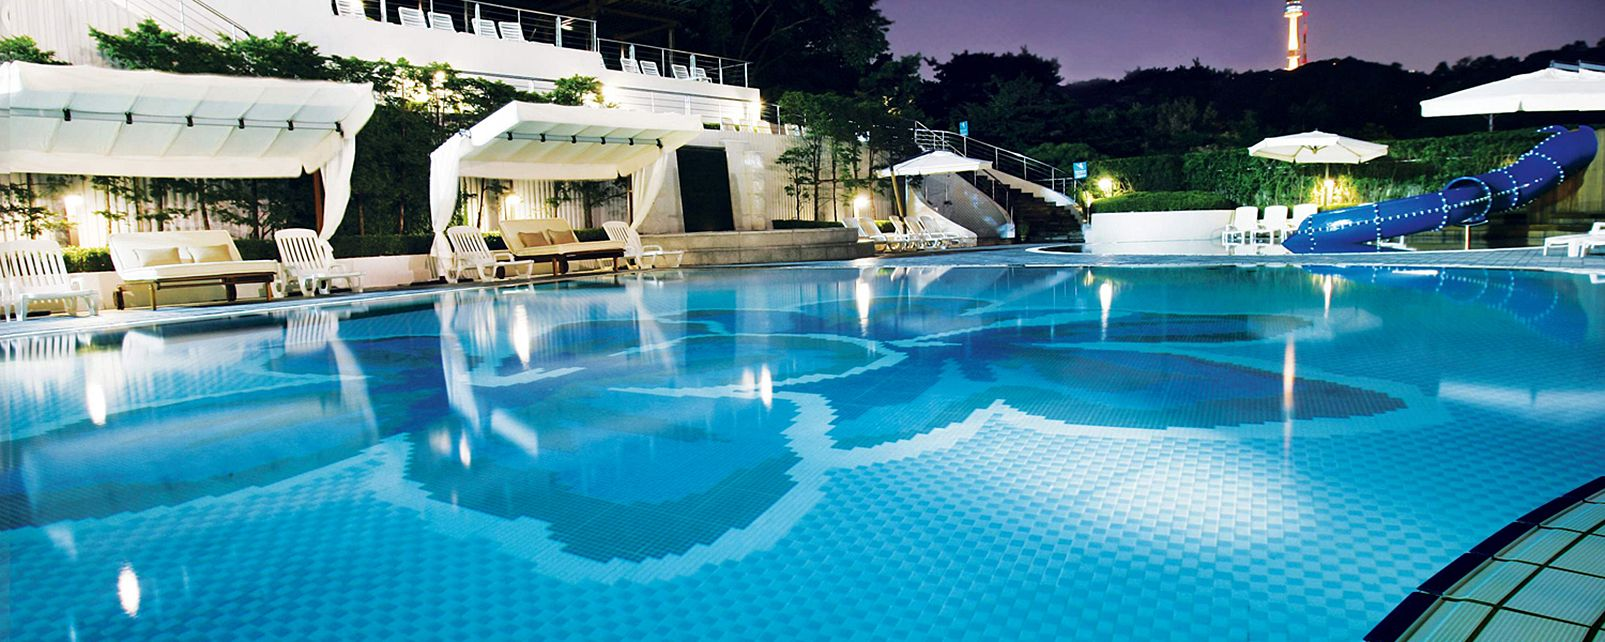 Hotel The Shilla Seoul